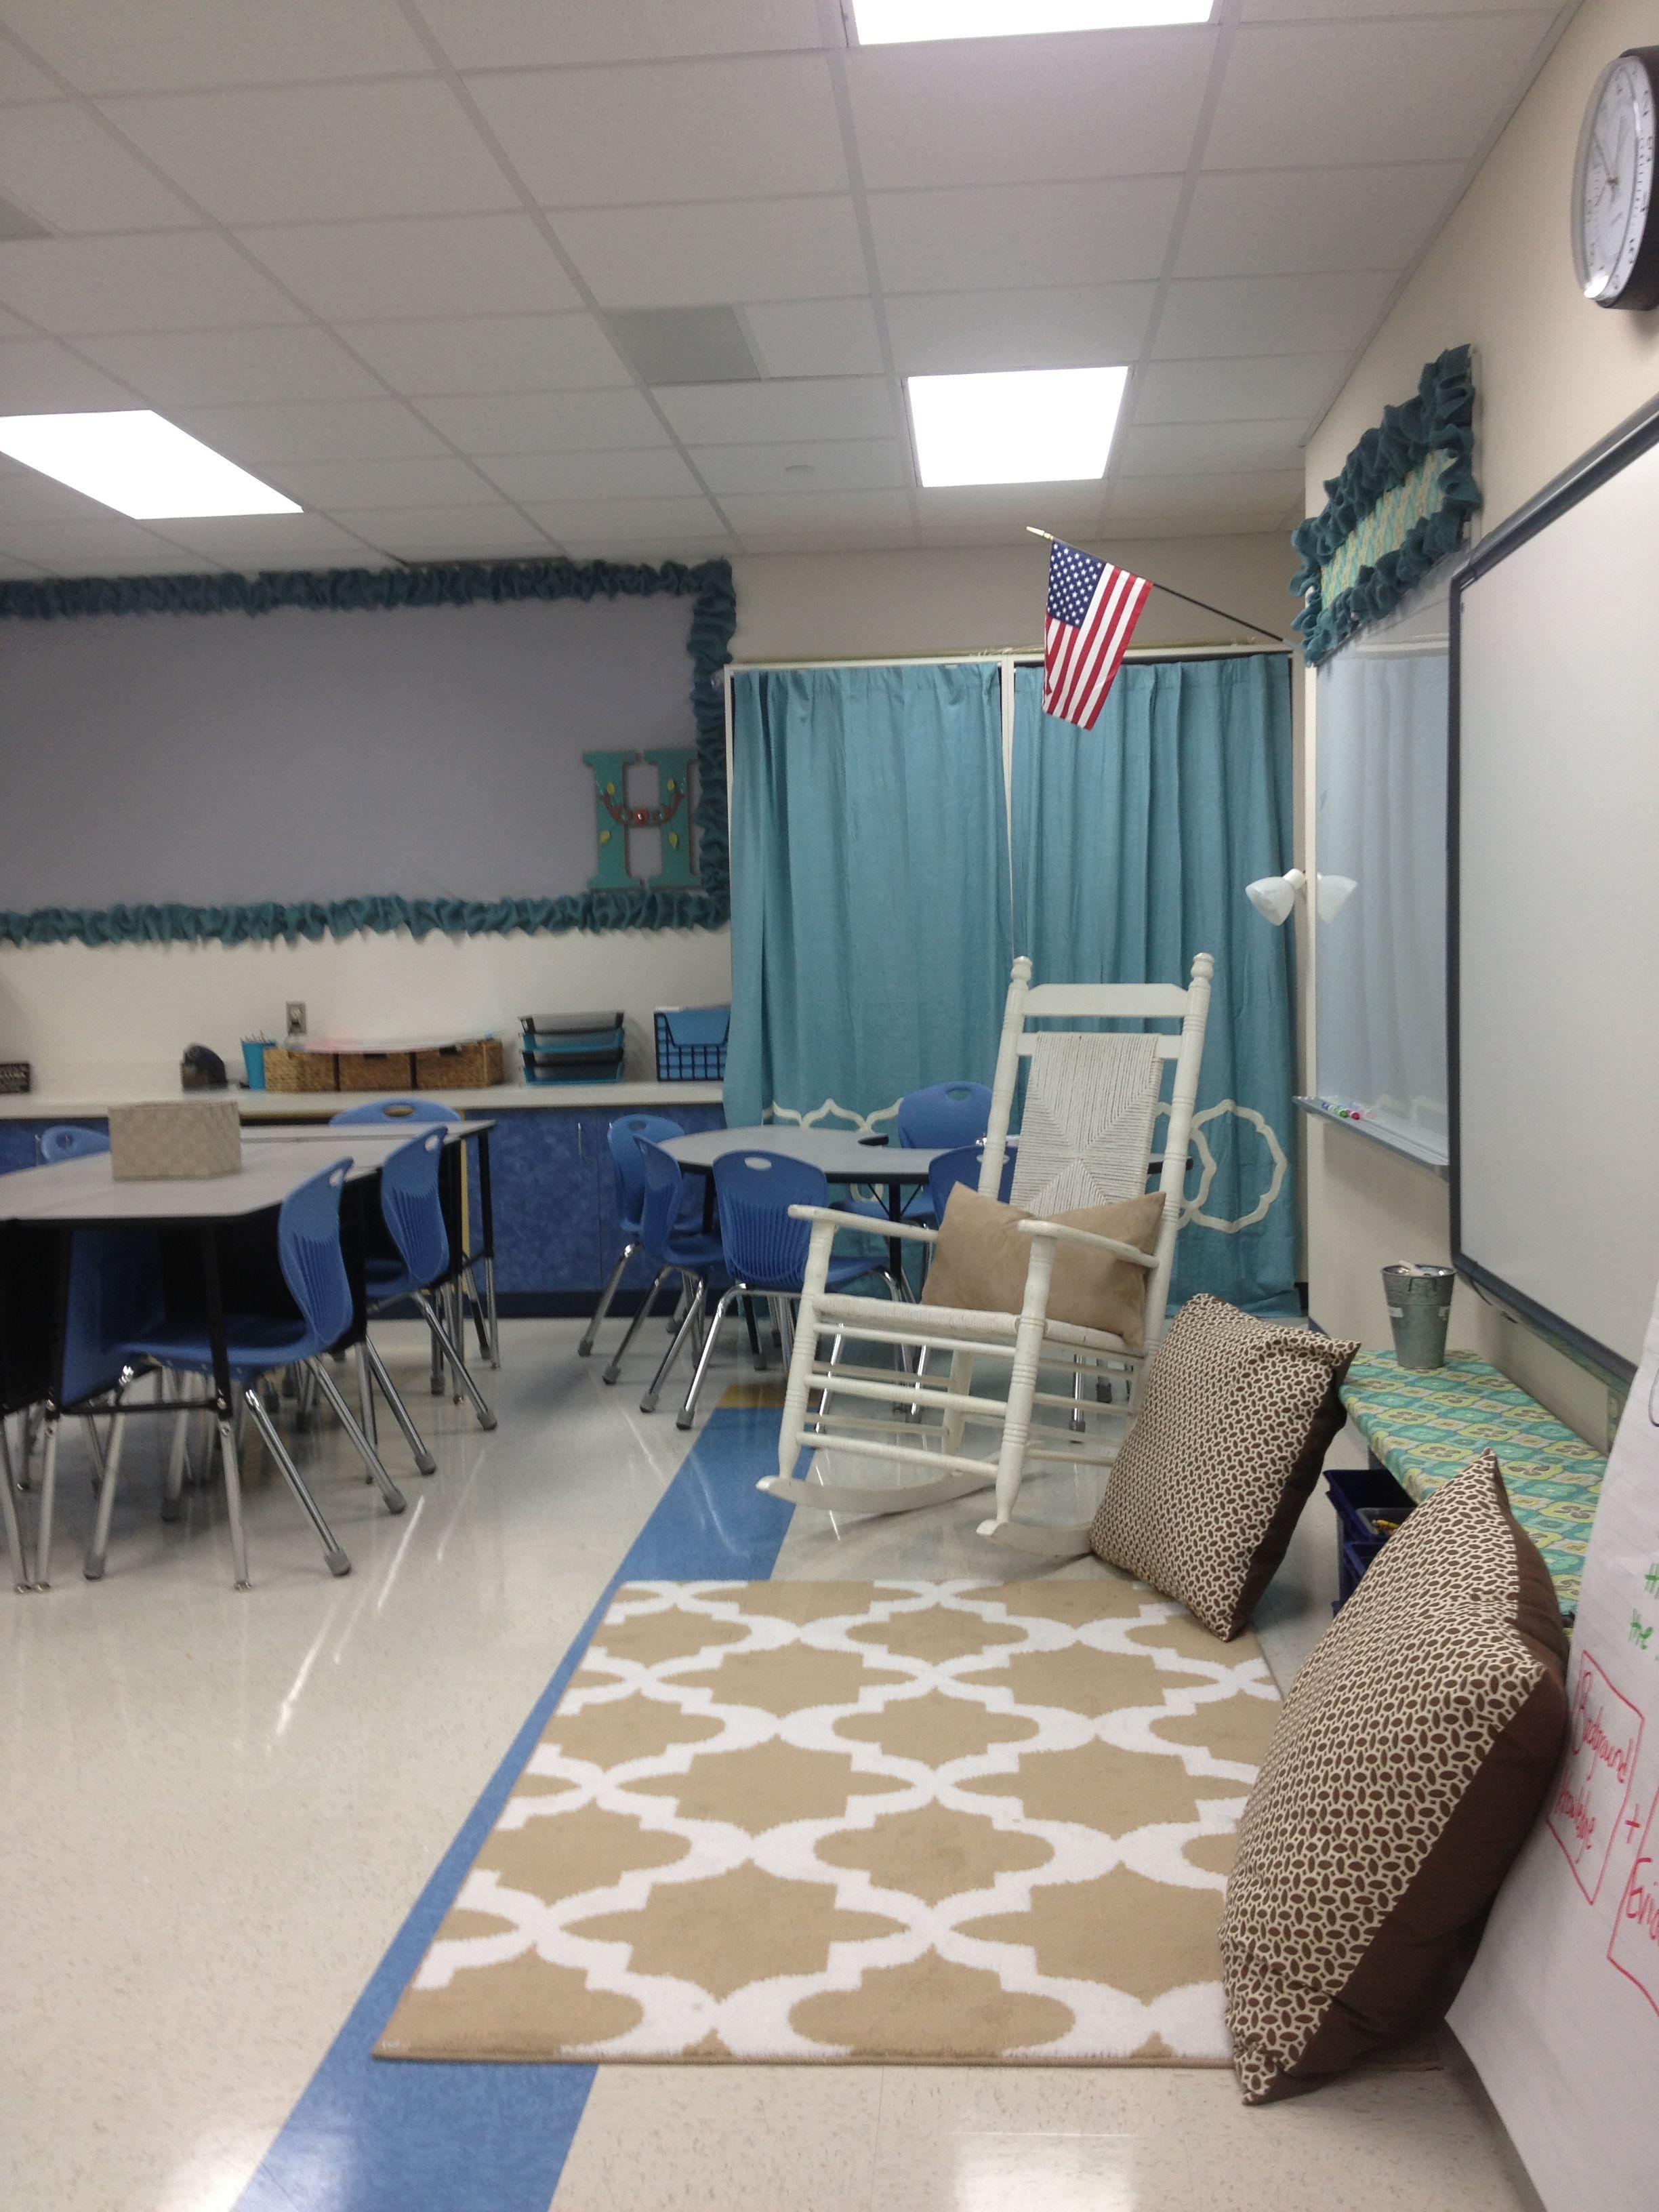 Homey Classroom Decor ~ My homey classroom decor pinterest